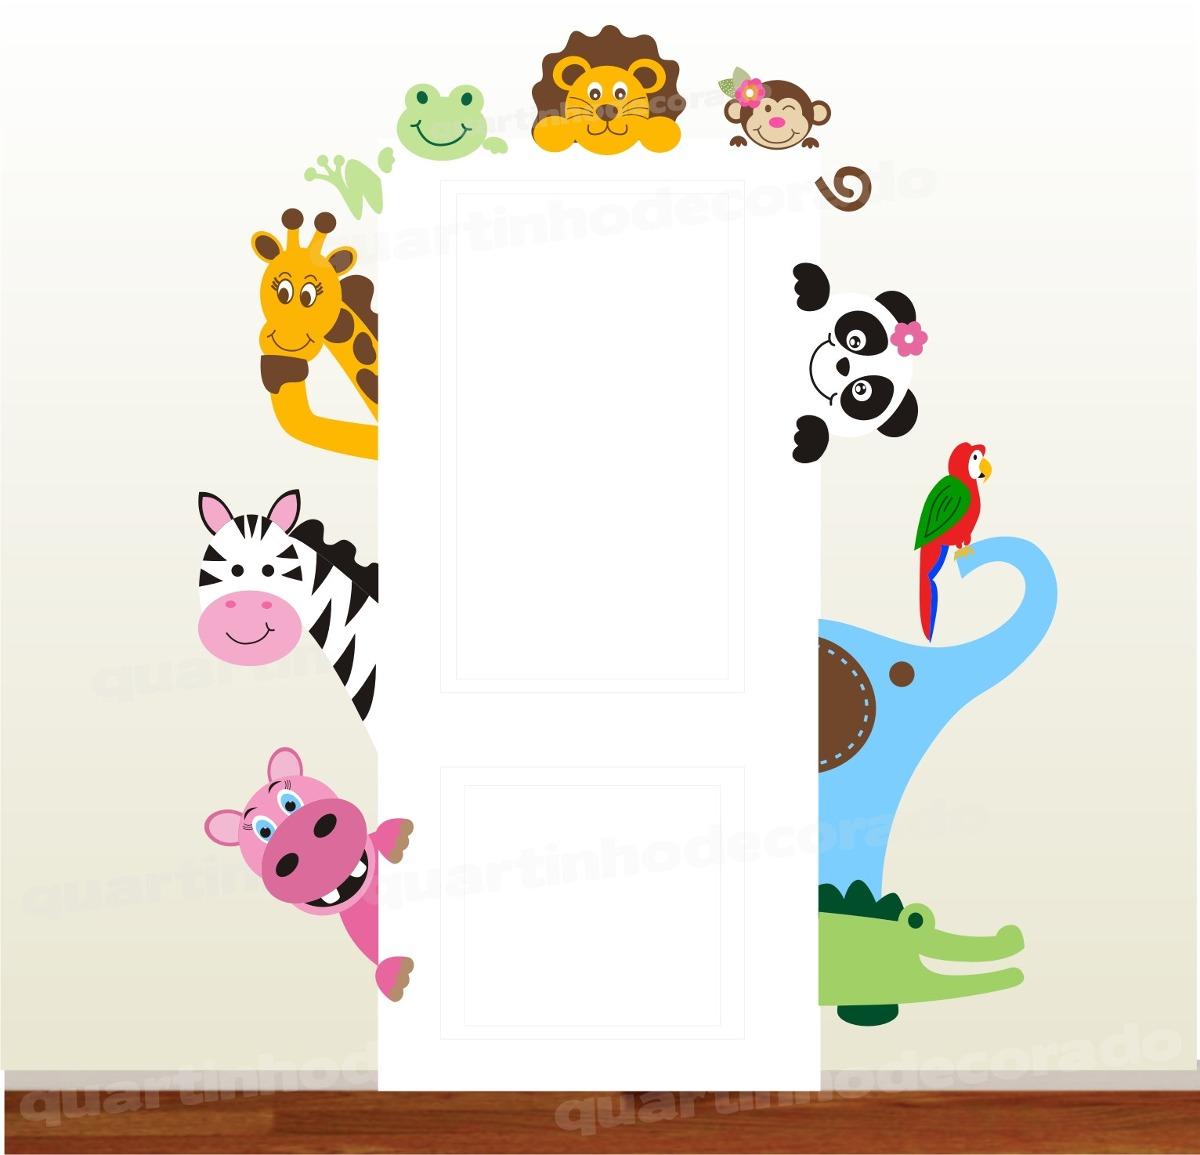 Revestimento Parede Quarto Infantil ~ Adesivo Infantil Safari Porta Decorativo Parede Bebe Zoo 64  R$ 148